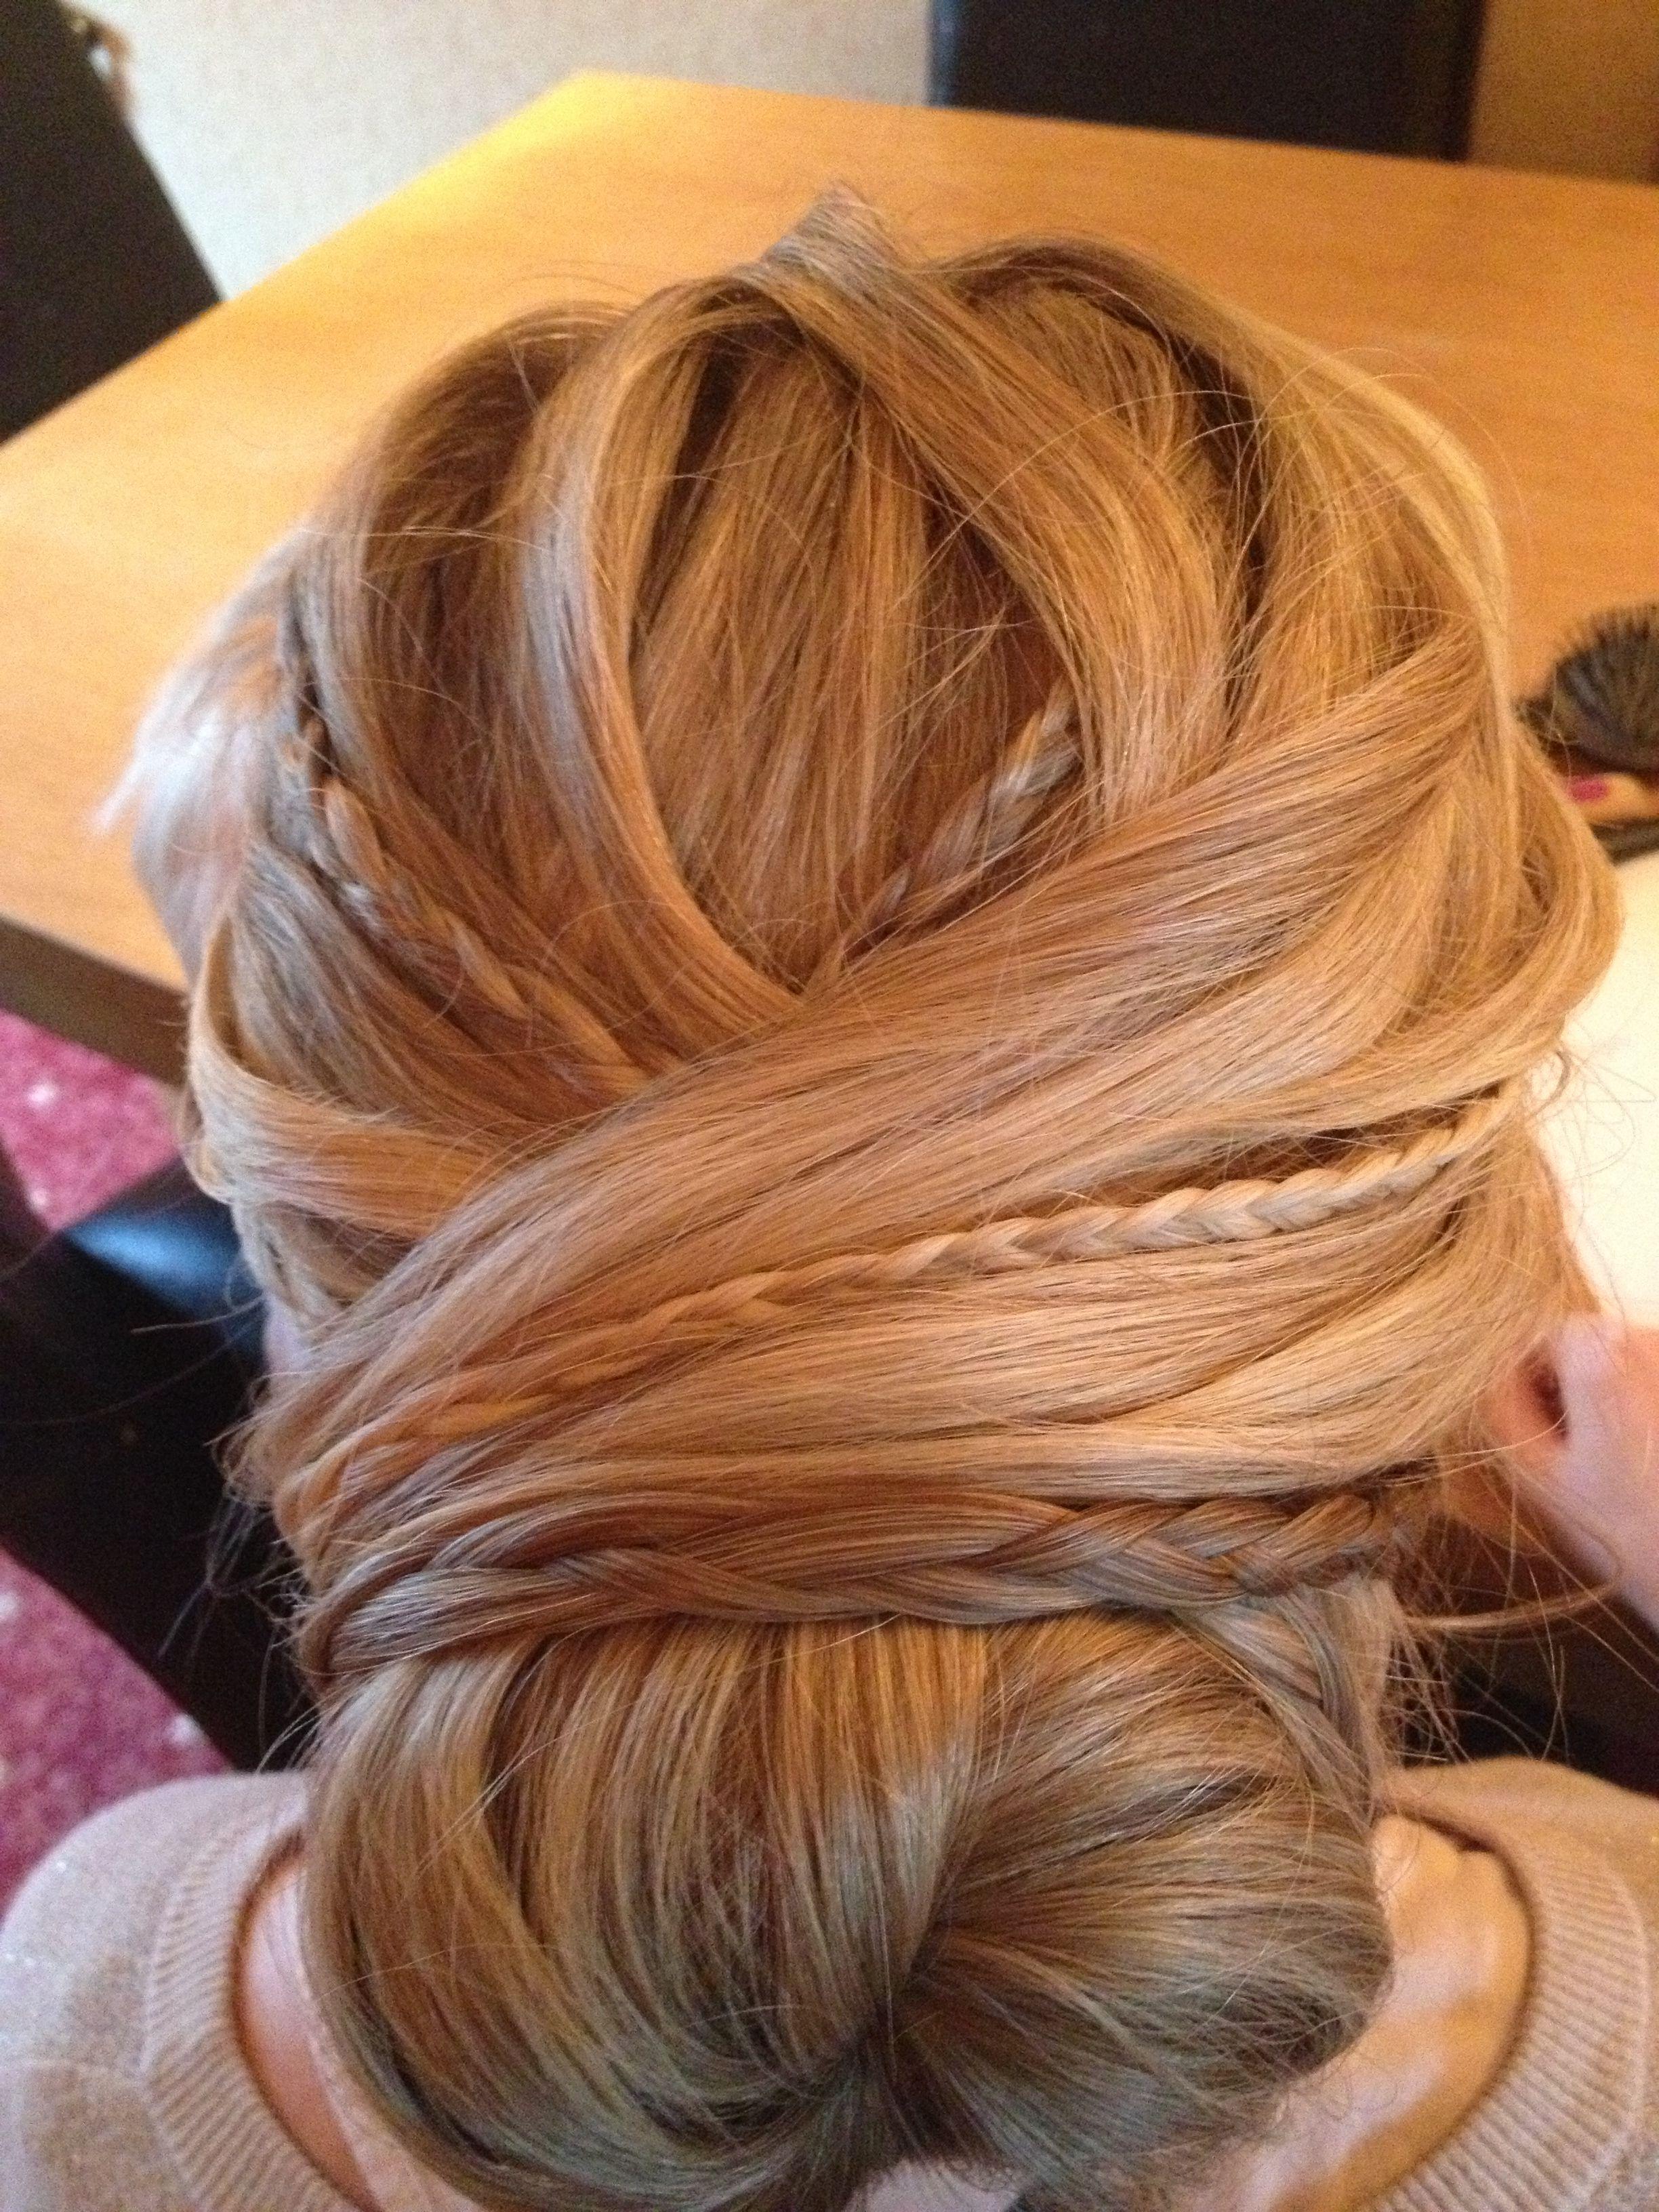 Braided bun for wedding | Hair styles, Prom hair, Long ...